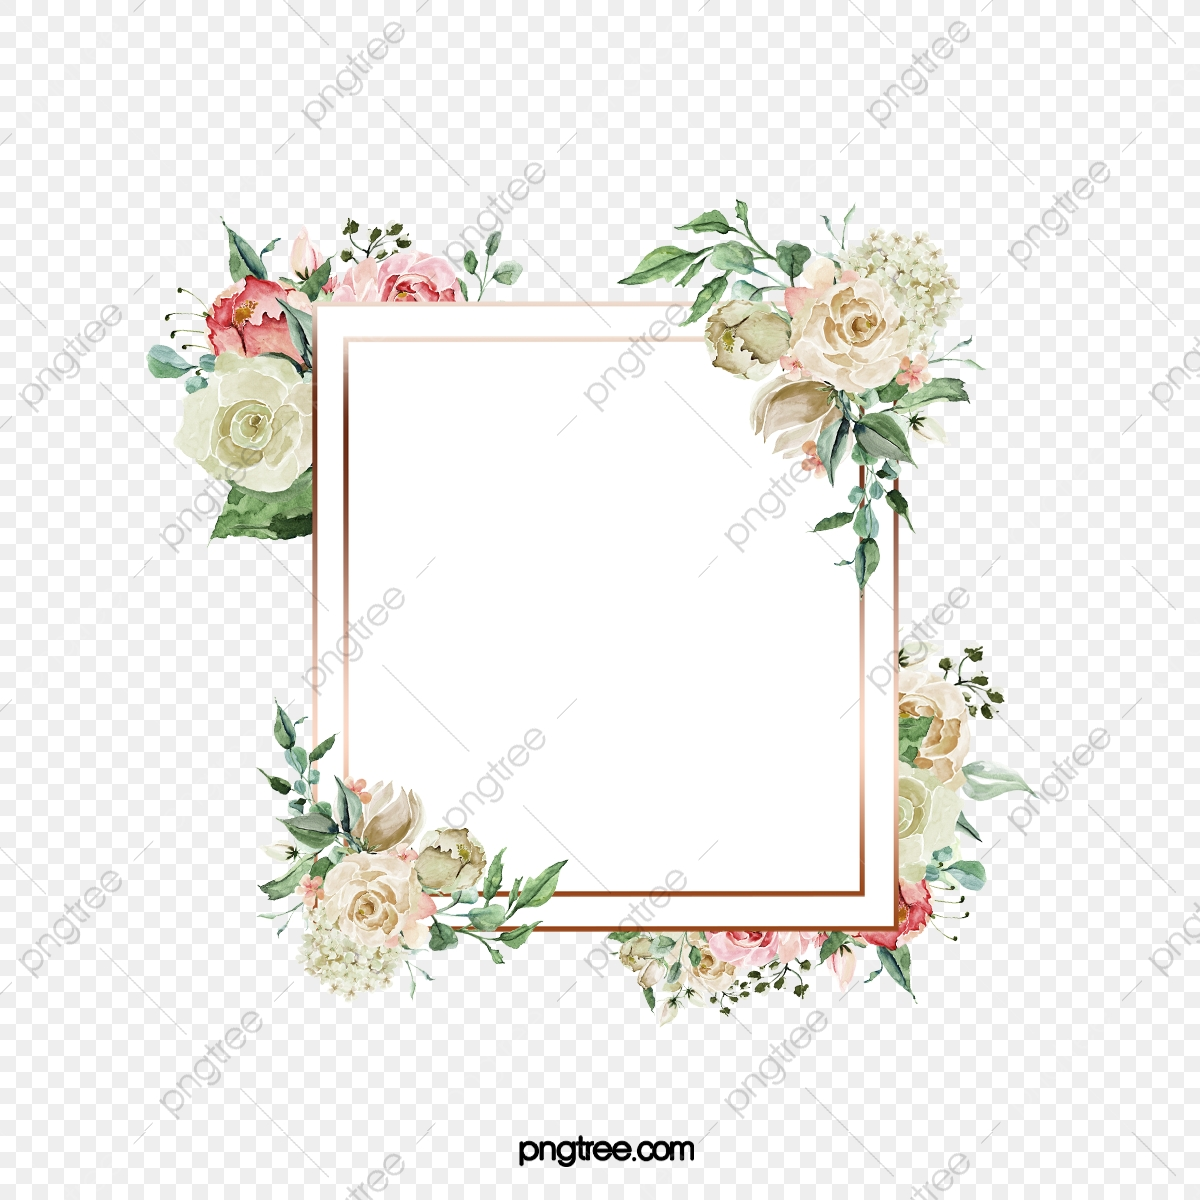 Bordes De Invitación Para La Boda De Flores Pintadas A Mano